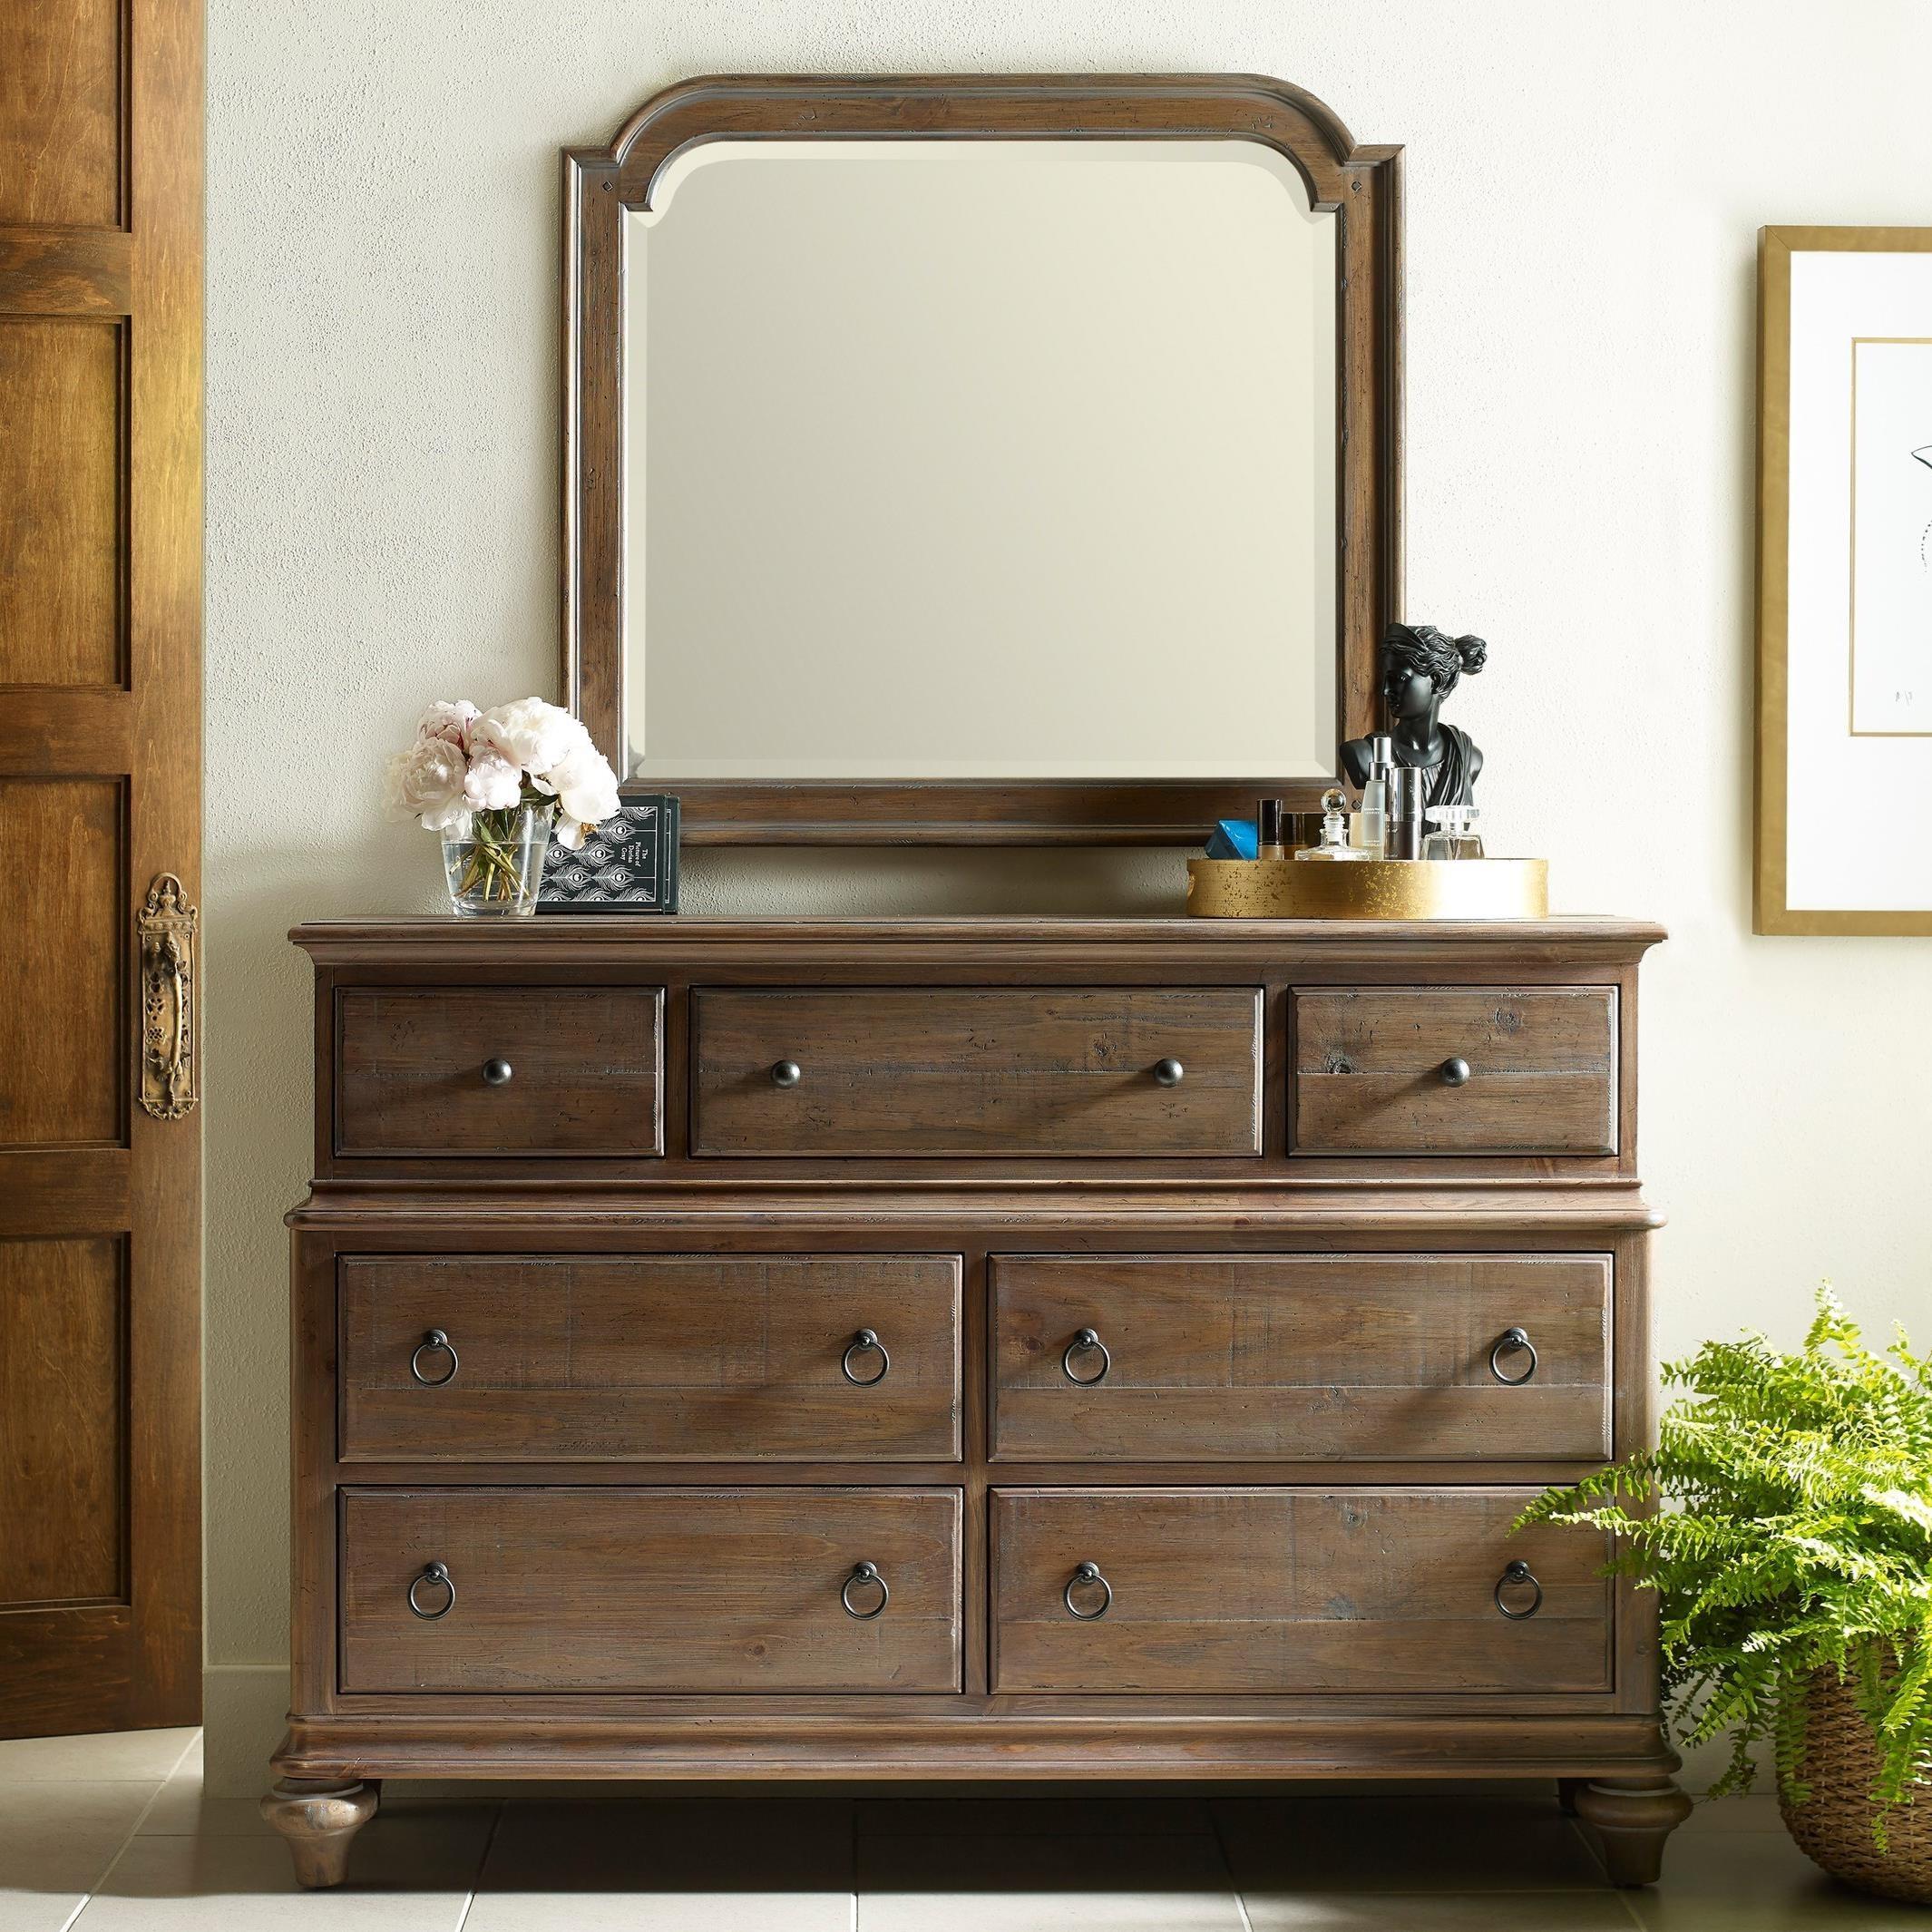 Wellington Dresser and Westland Mirror Combination